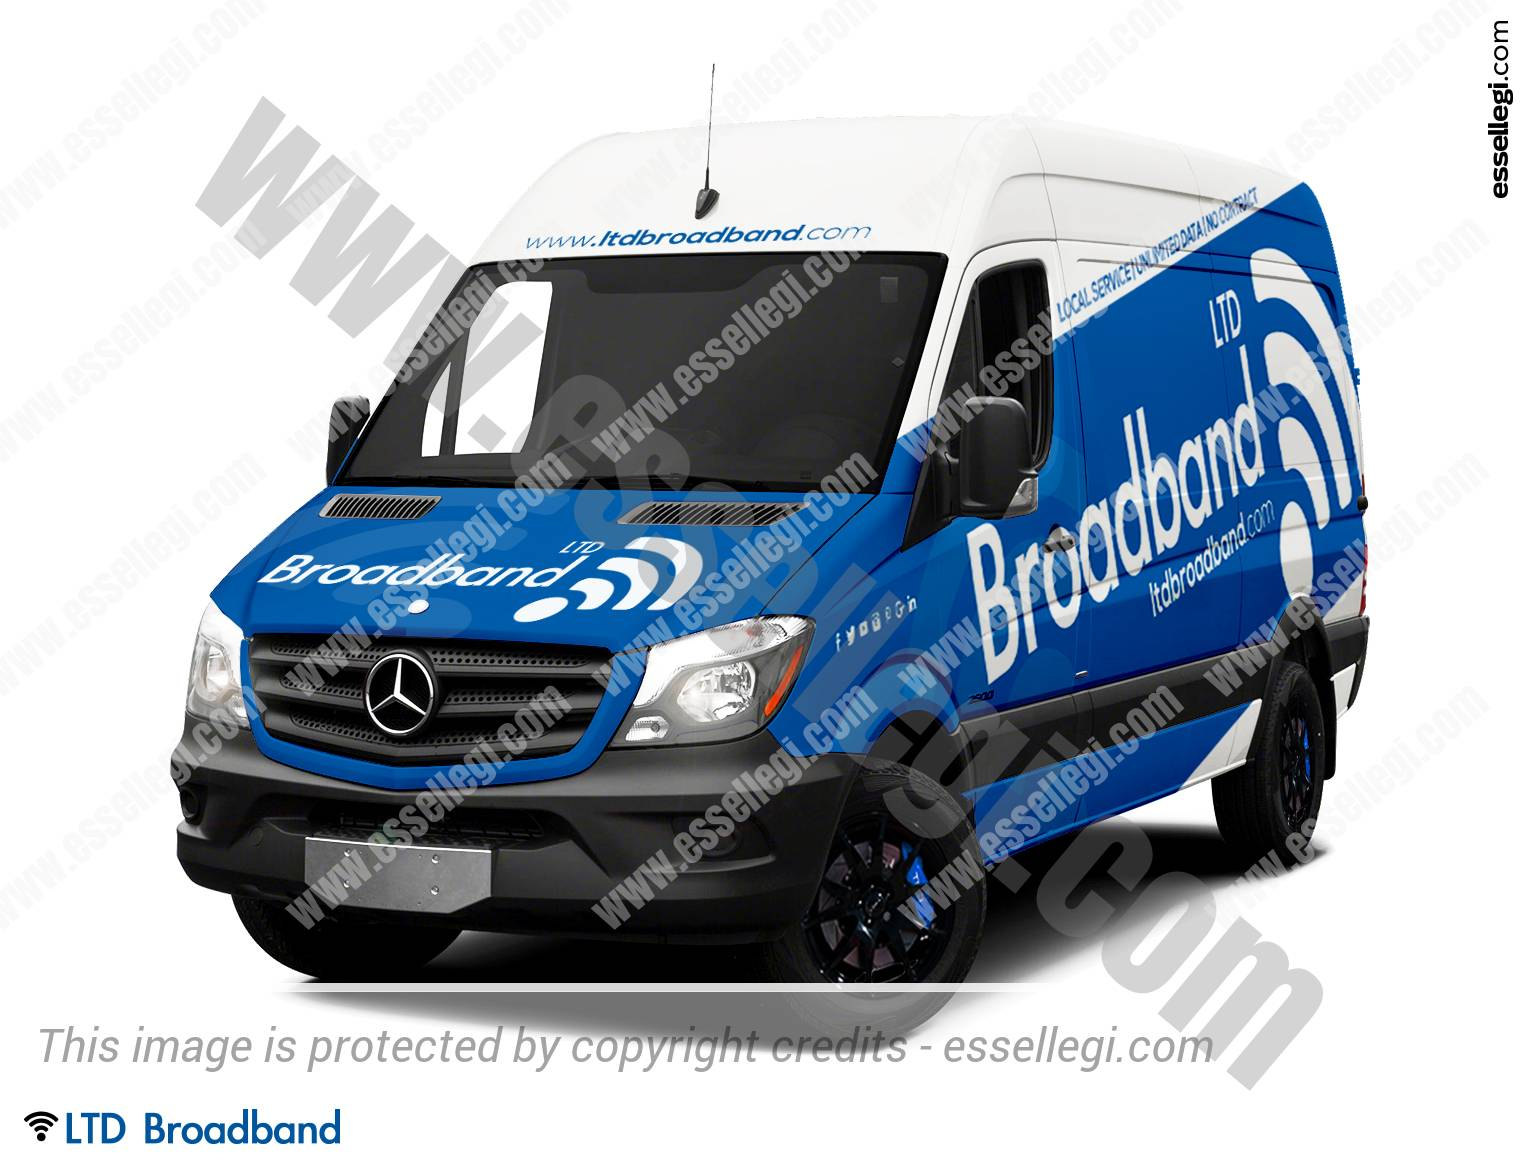 Mercedes Sprinter Van | Van Wrap Design by Essellegi. Van Signs, Van Signage, Van Wrapping, Van Signwriting, Van Wrap Designer, Signs for Van, Van Logo by Essellegi.